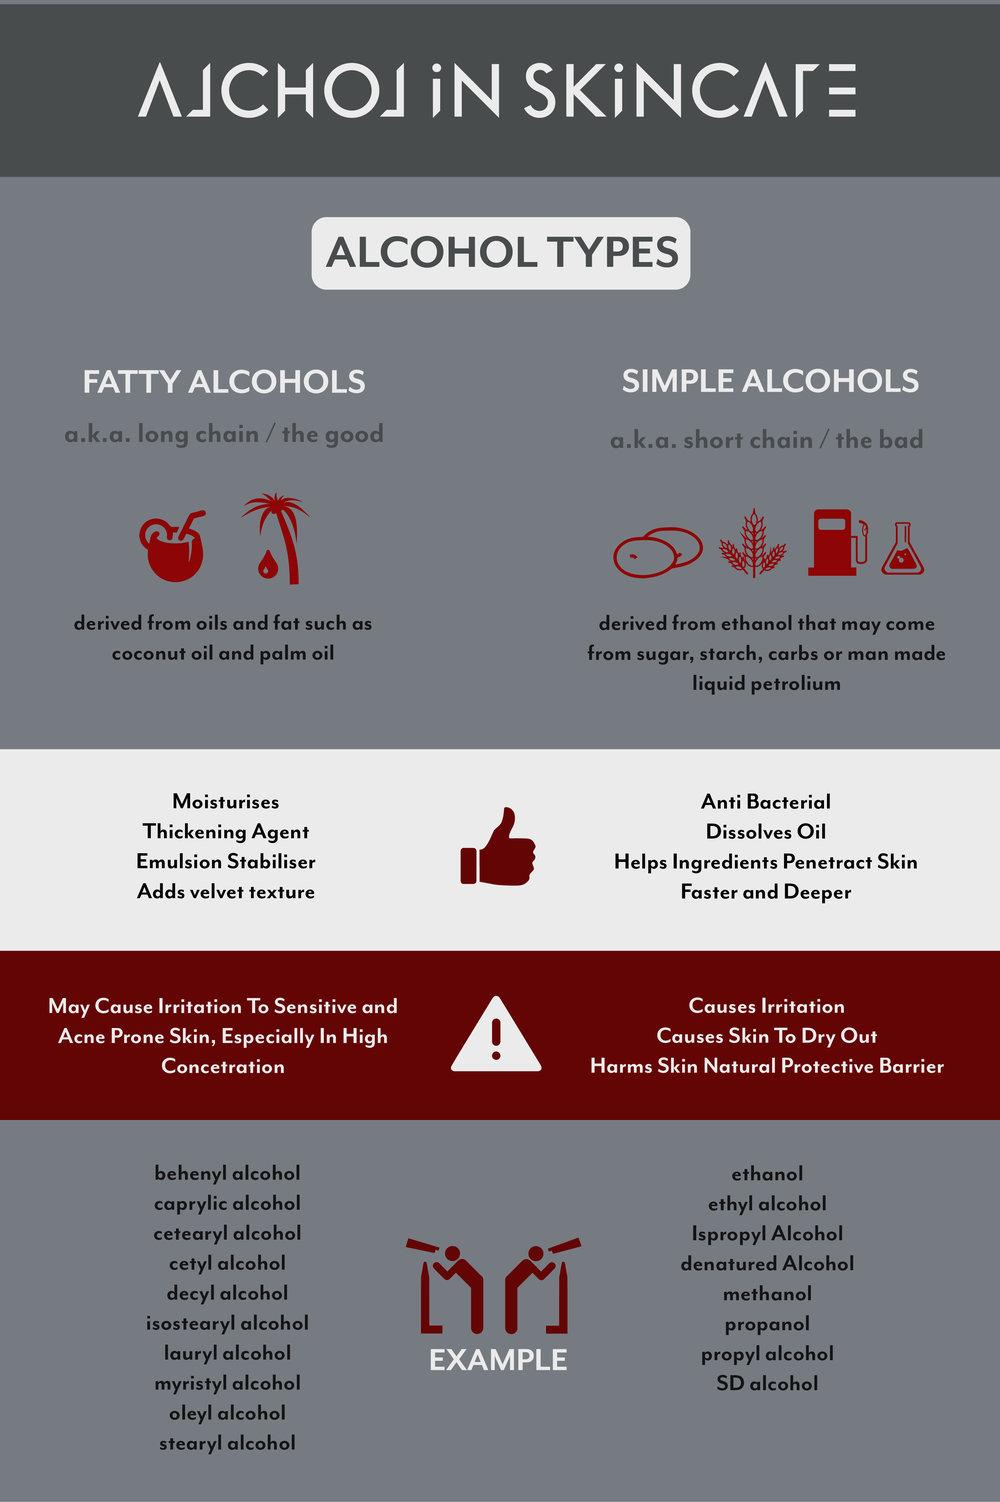 Helloimsam_alcohol_in_skincare_infographic